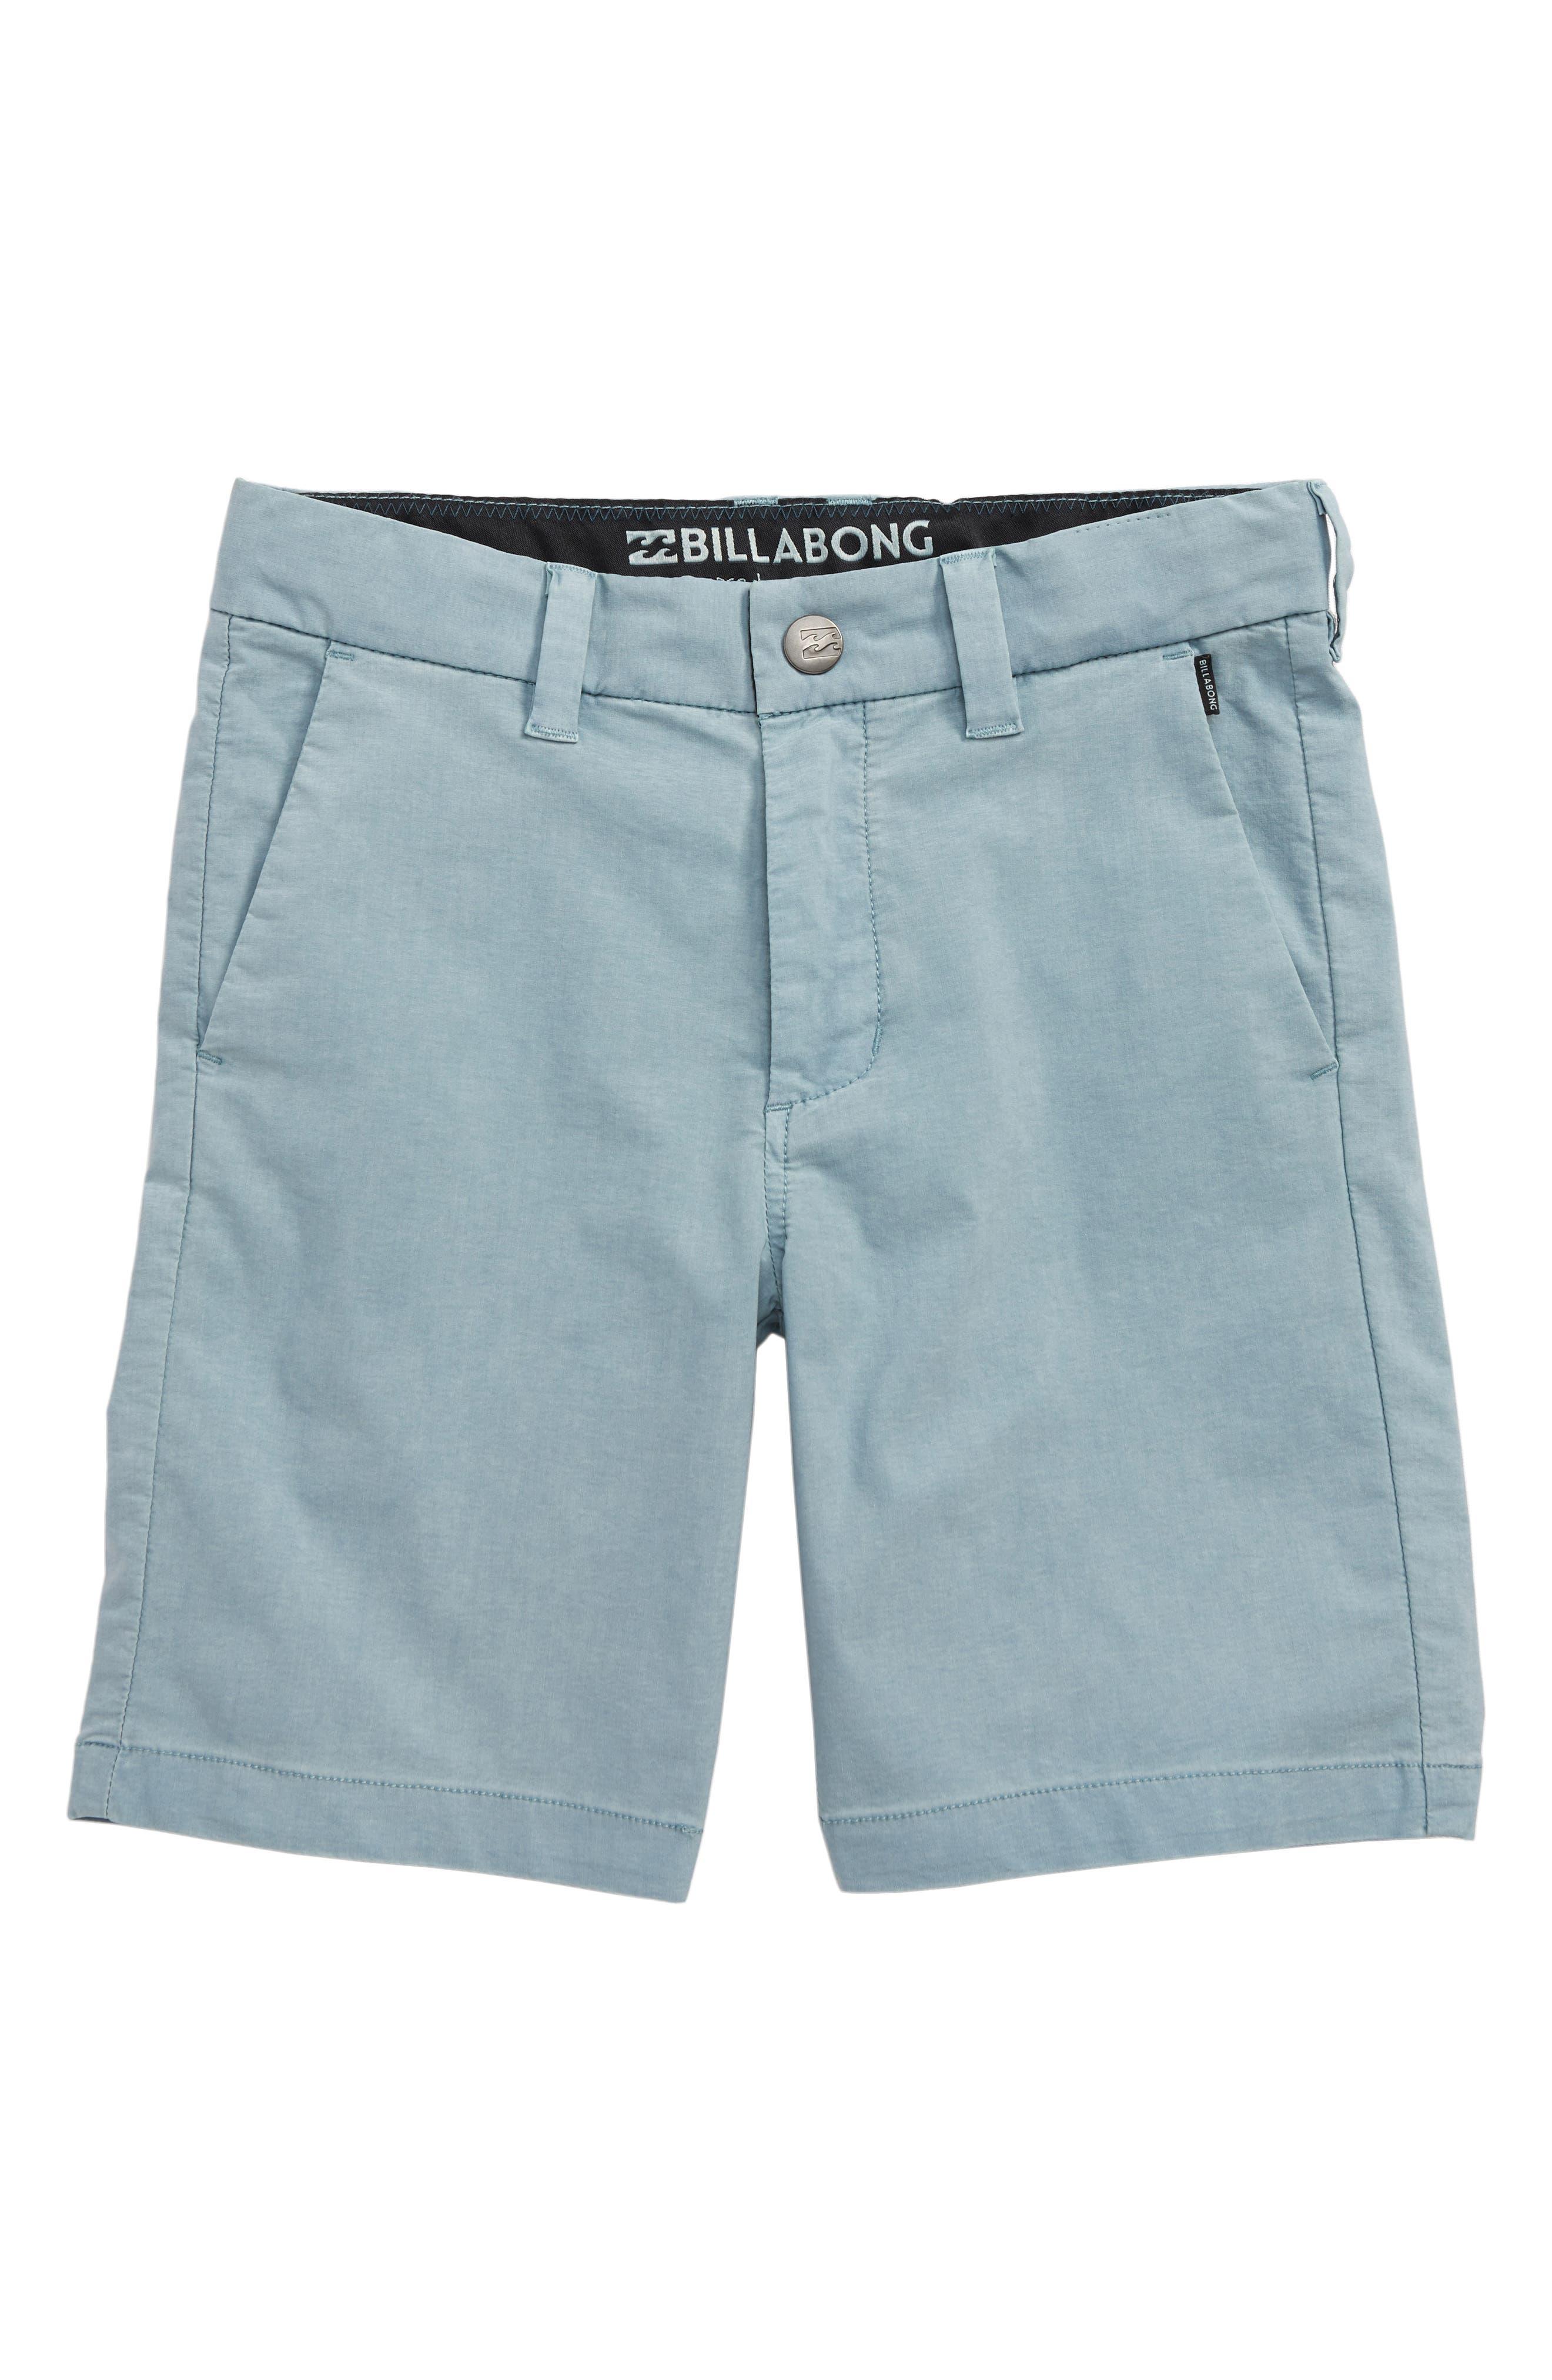 Boys Billabong New Order X Overdye Hybrid Shorts Size M (5)  Blue